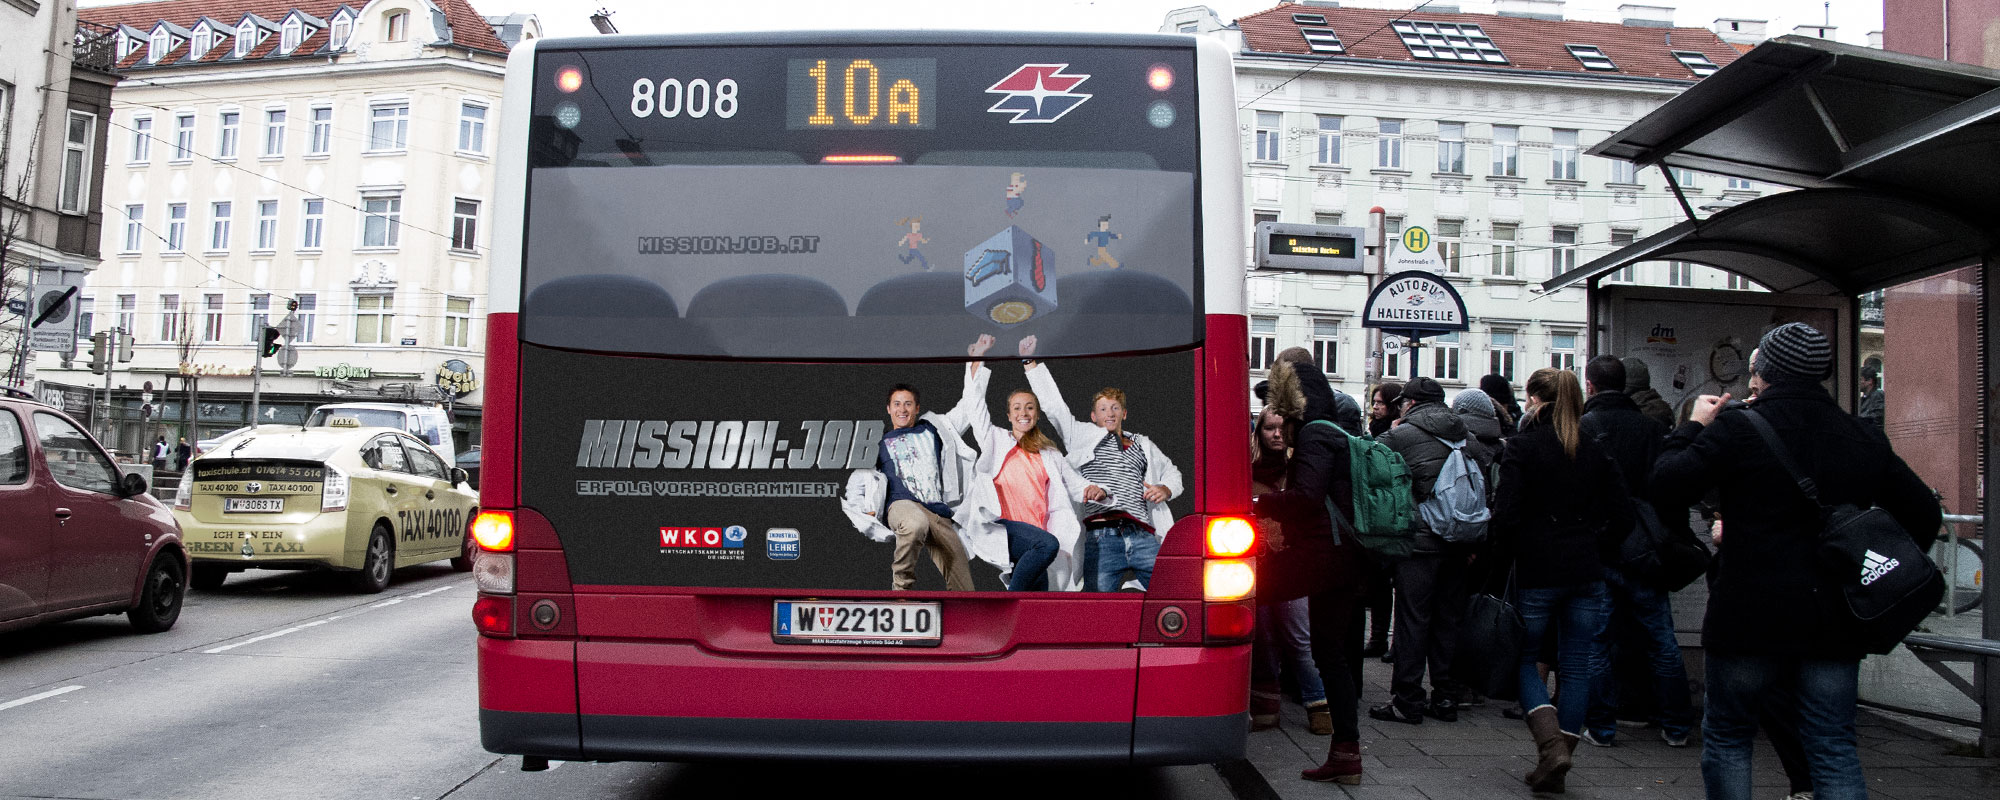 WKO_MJ2_Kampagne_Bus_01